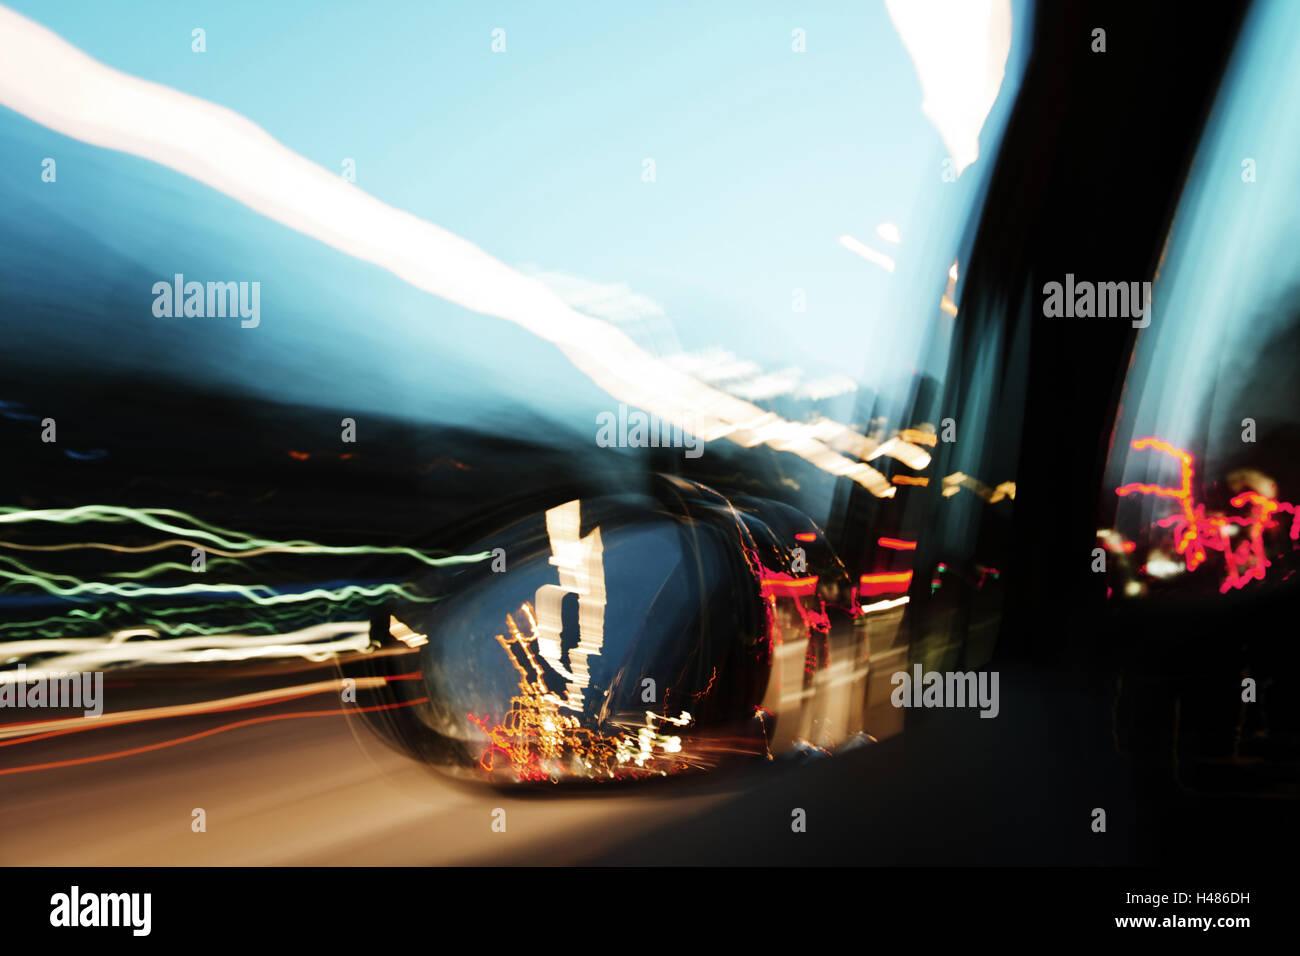 Car, journey, night, landing stages, neon light, fish market, Mitte, Hanseatic City of Hamburg, Germany, - Stock Image